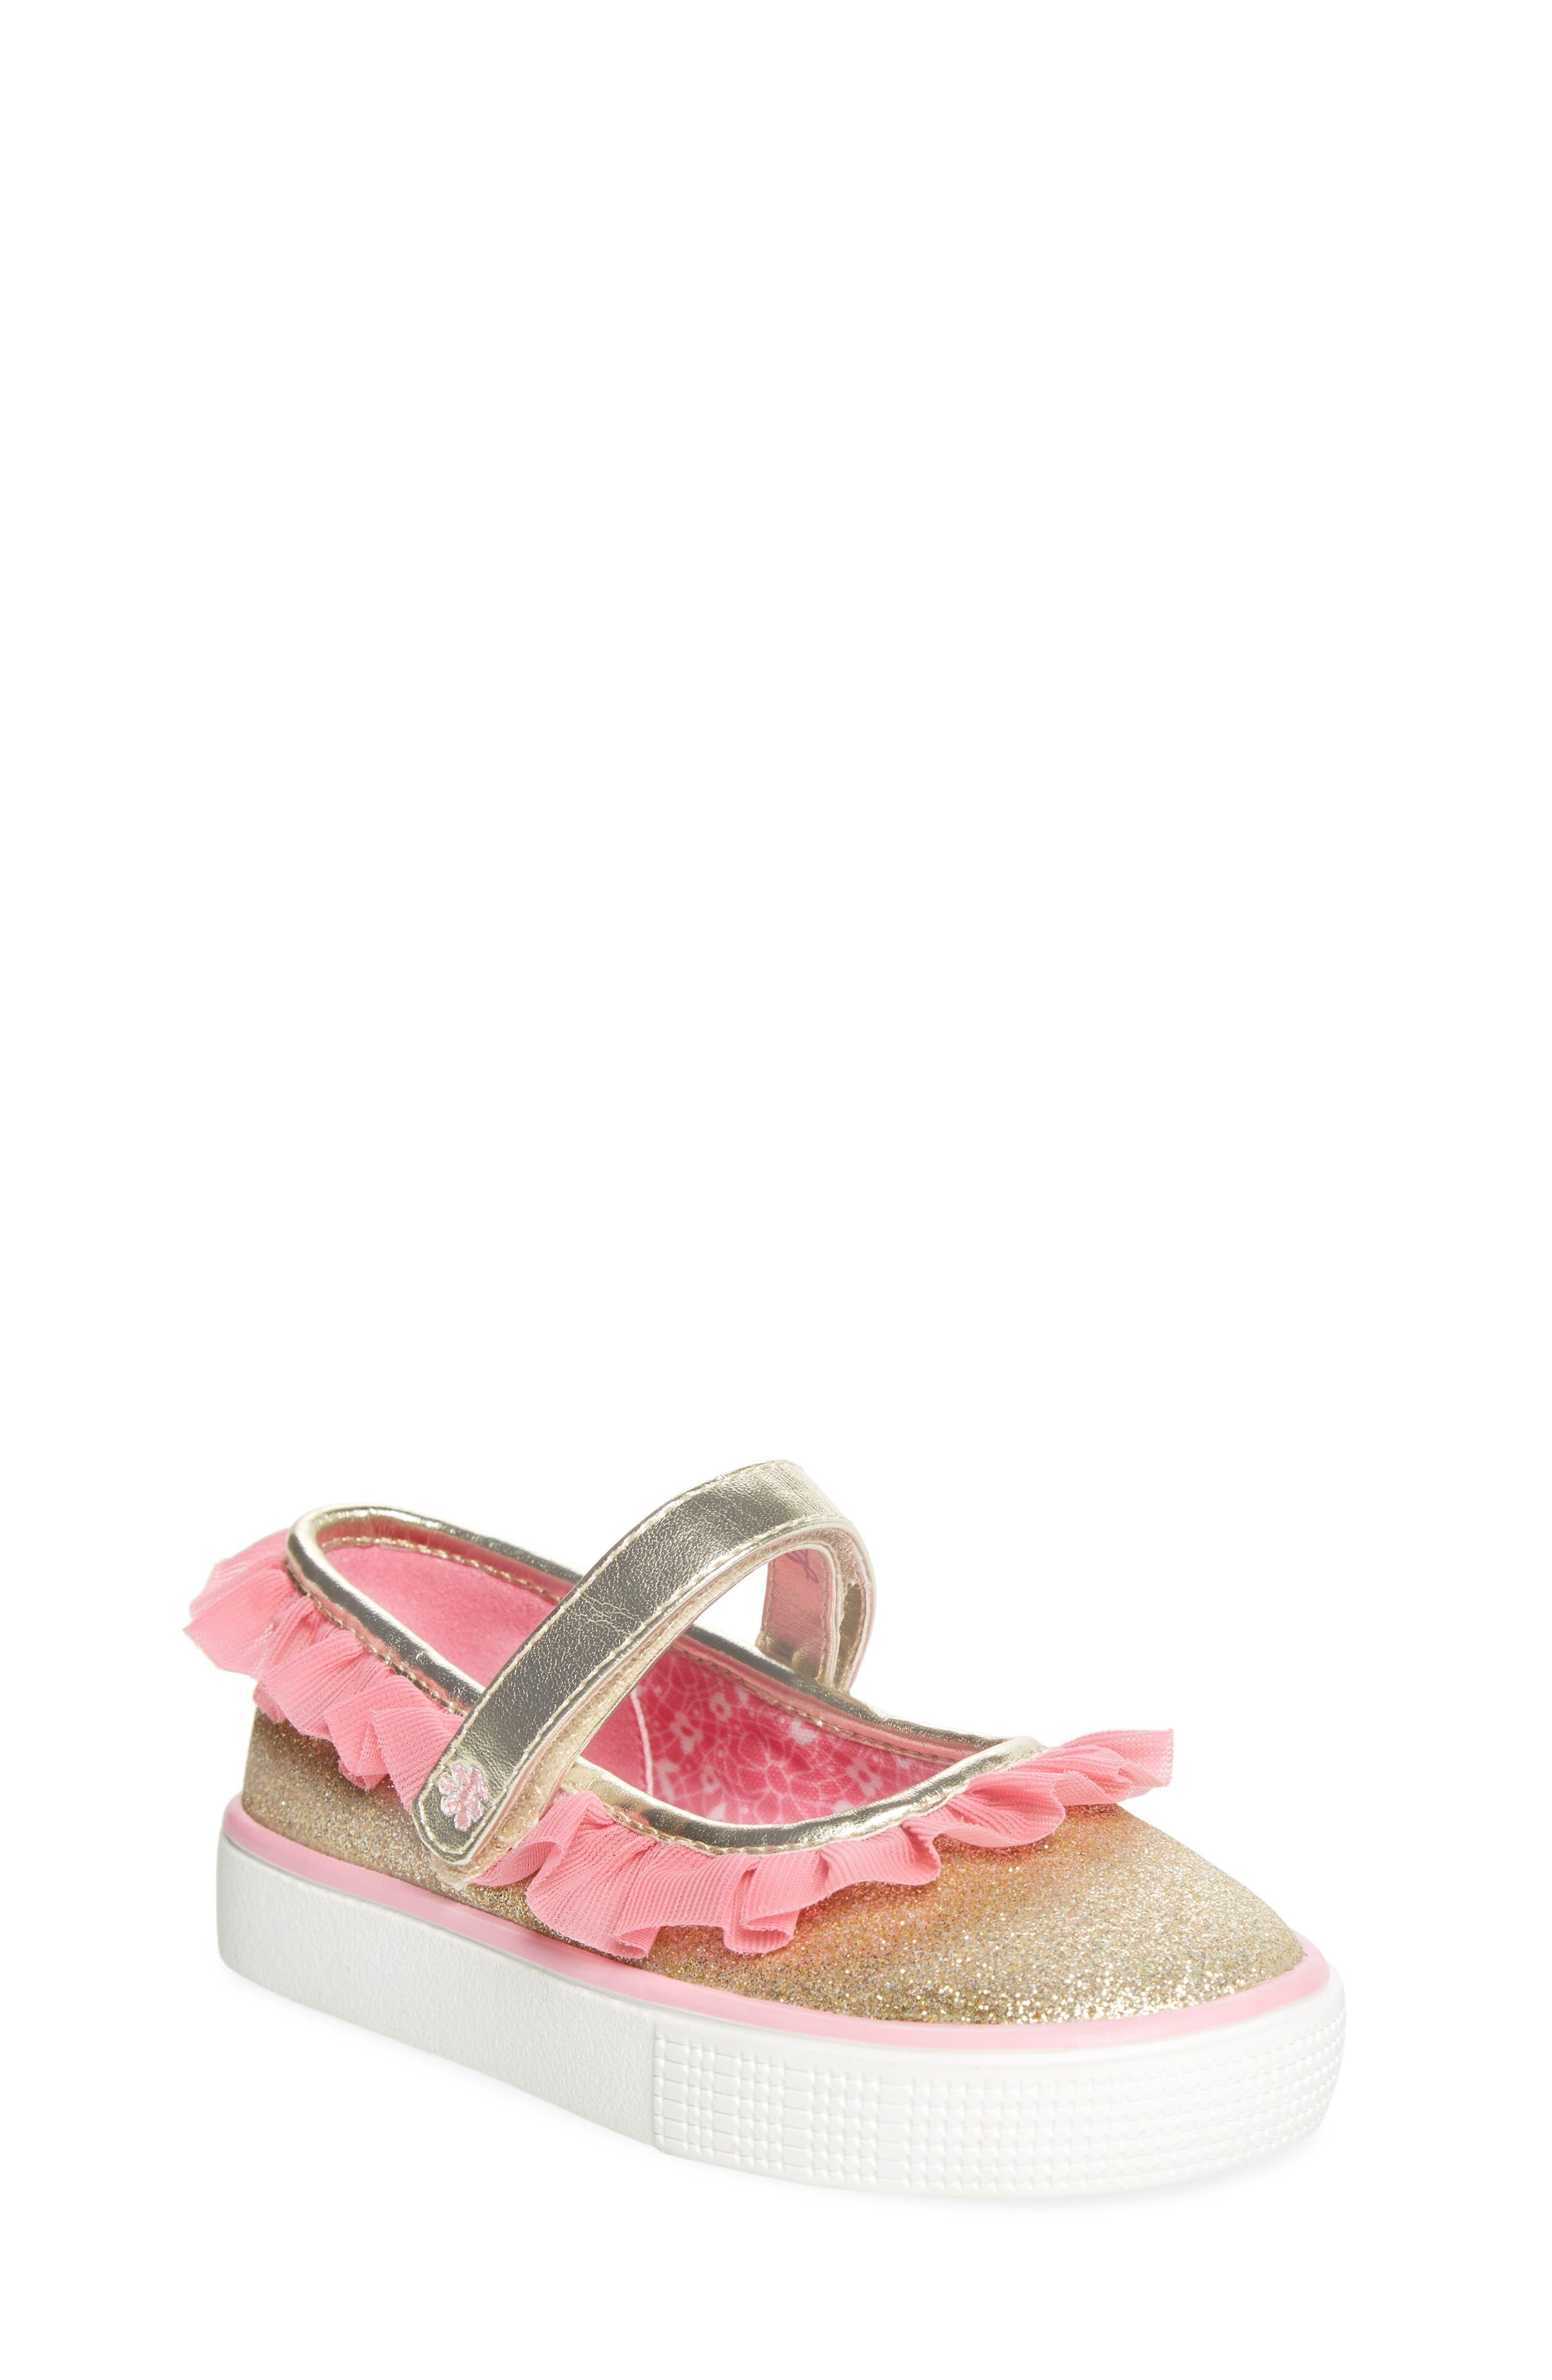 Ashlyn Tulle Mary Jane Sneaker,                         Main,                         color, Gold